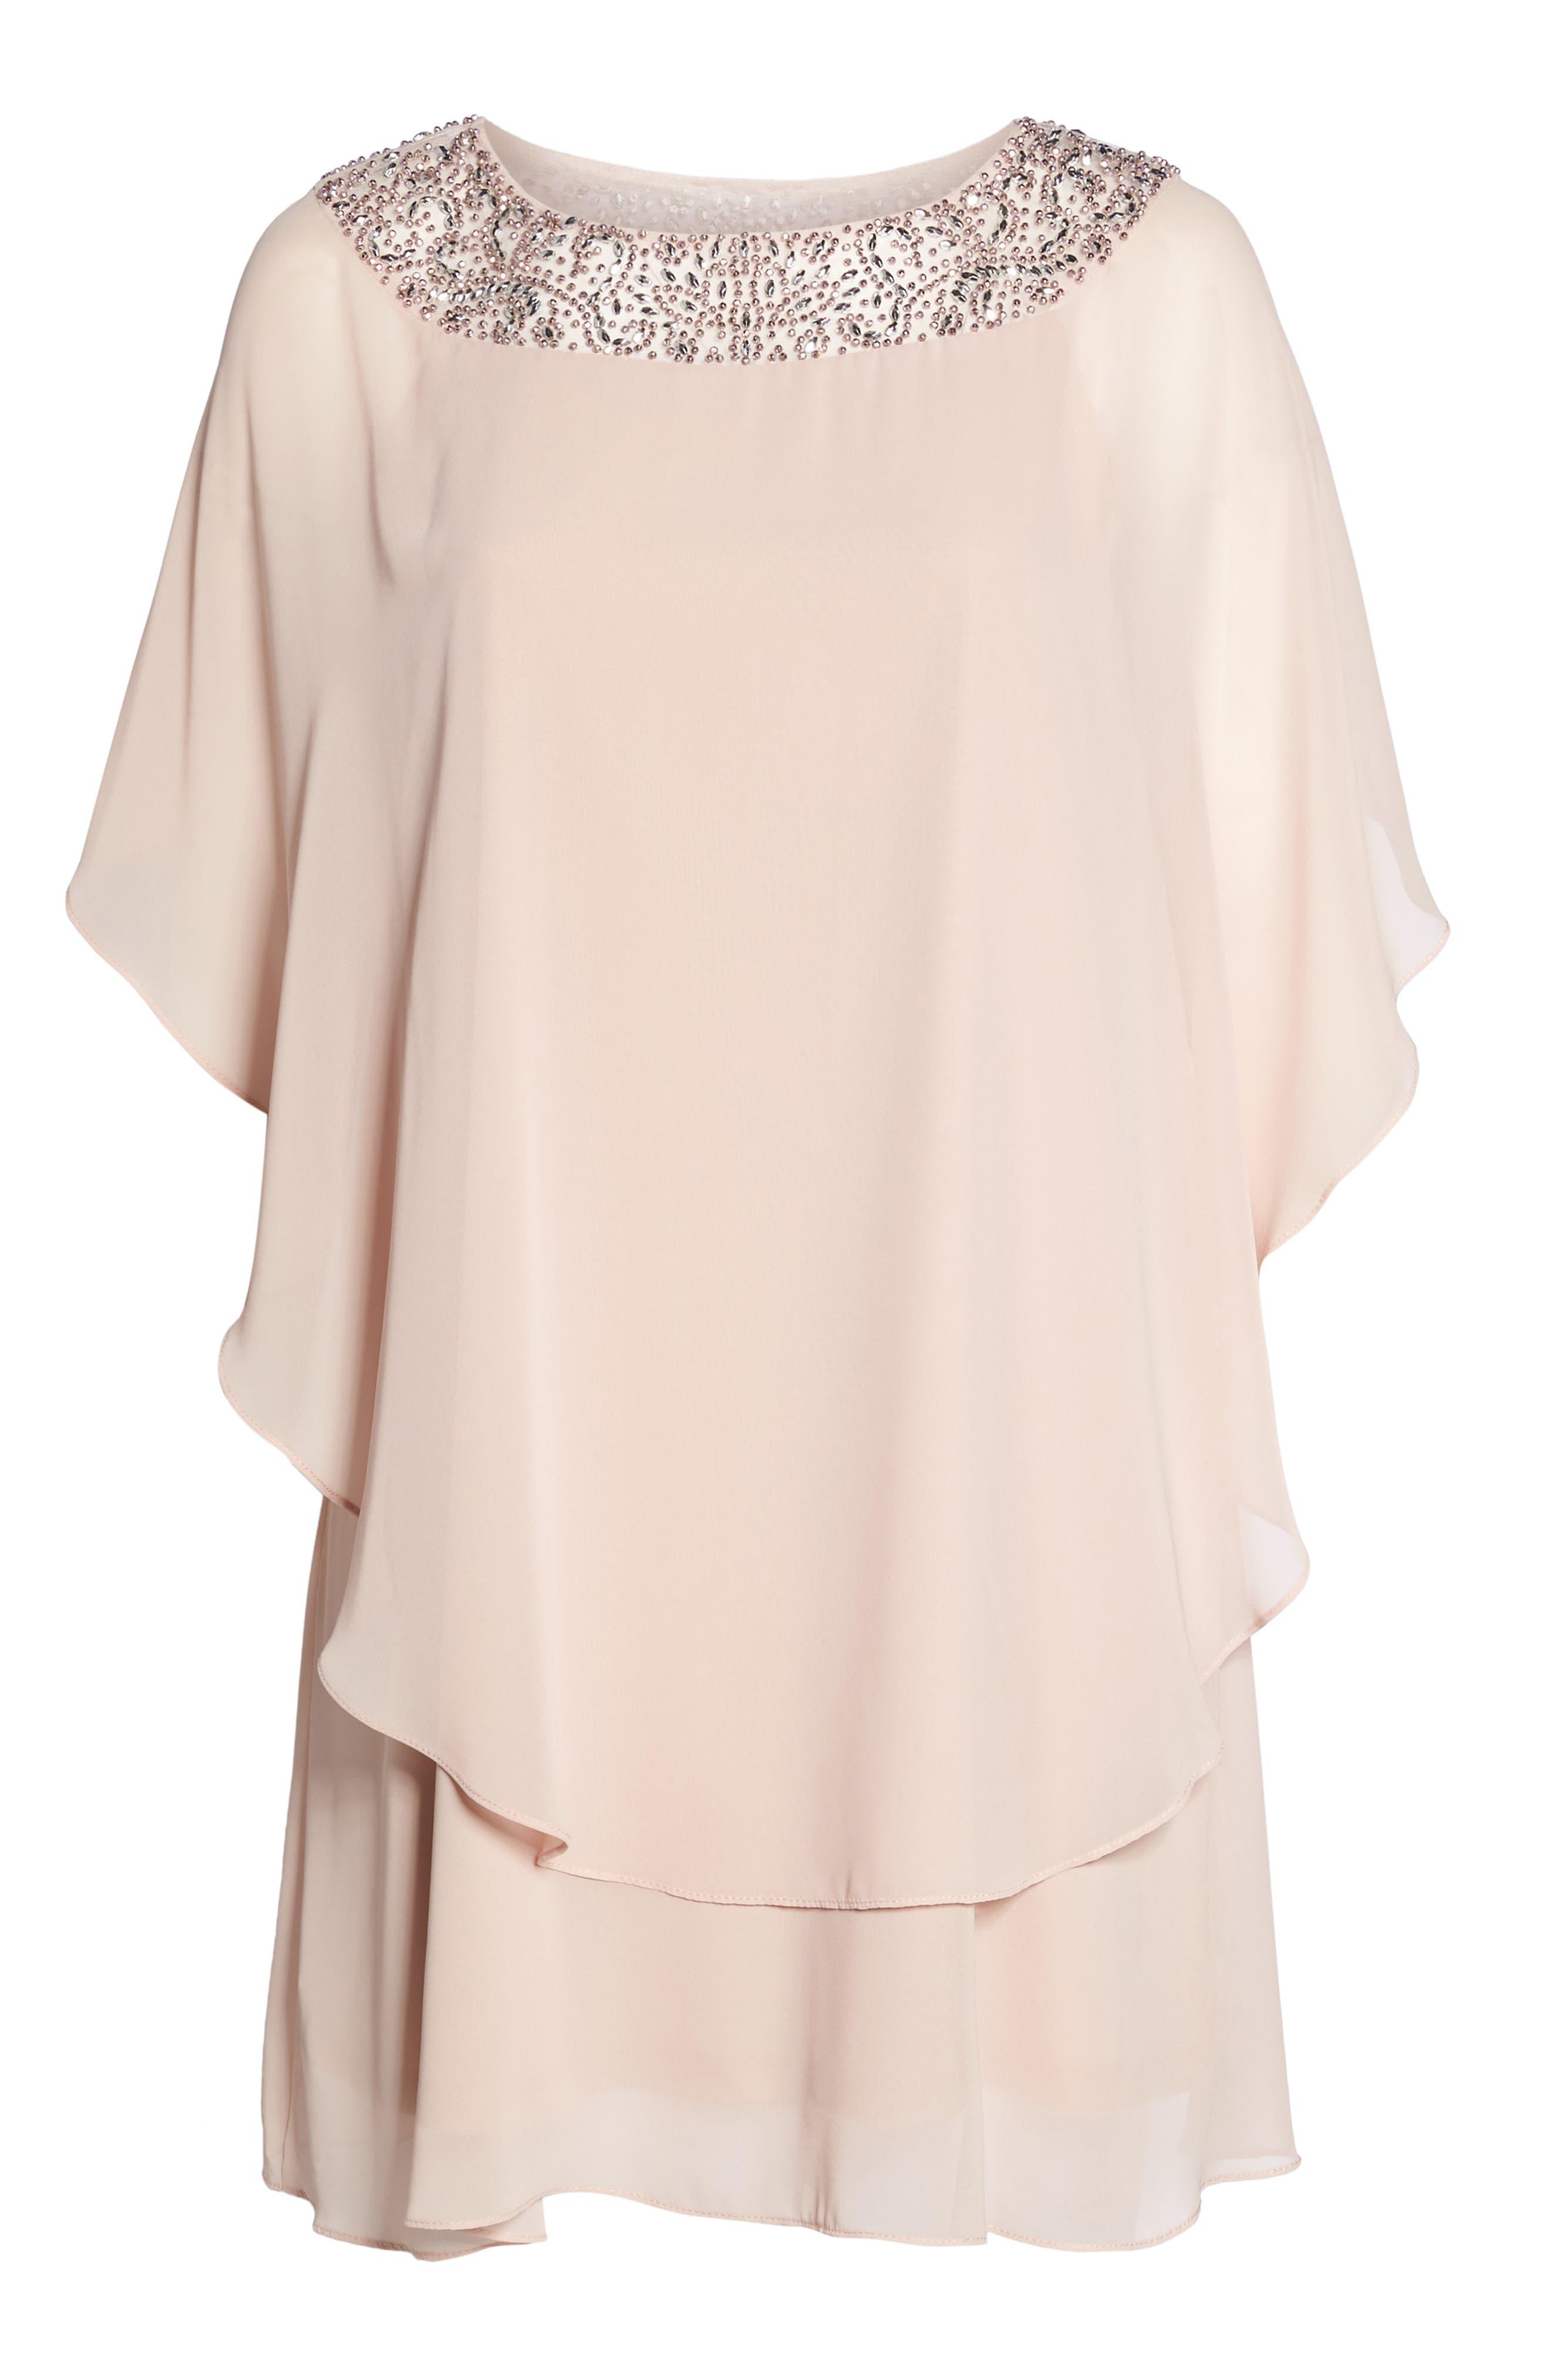 XSCAPE, Beaded Neck Chiffon Overlay Dress, Alternate thumbnail 7, color, BLUSH/ SILVER